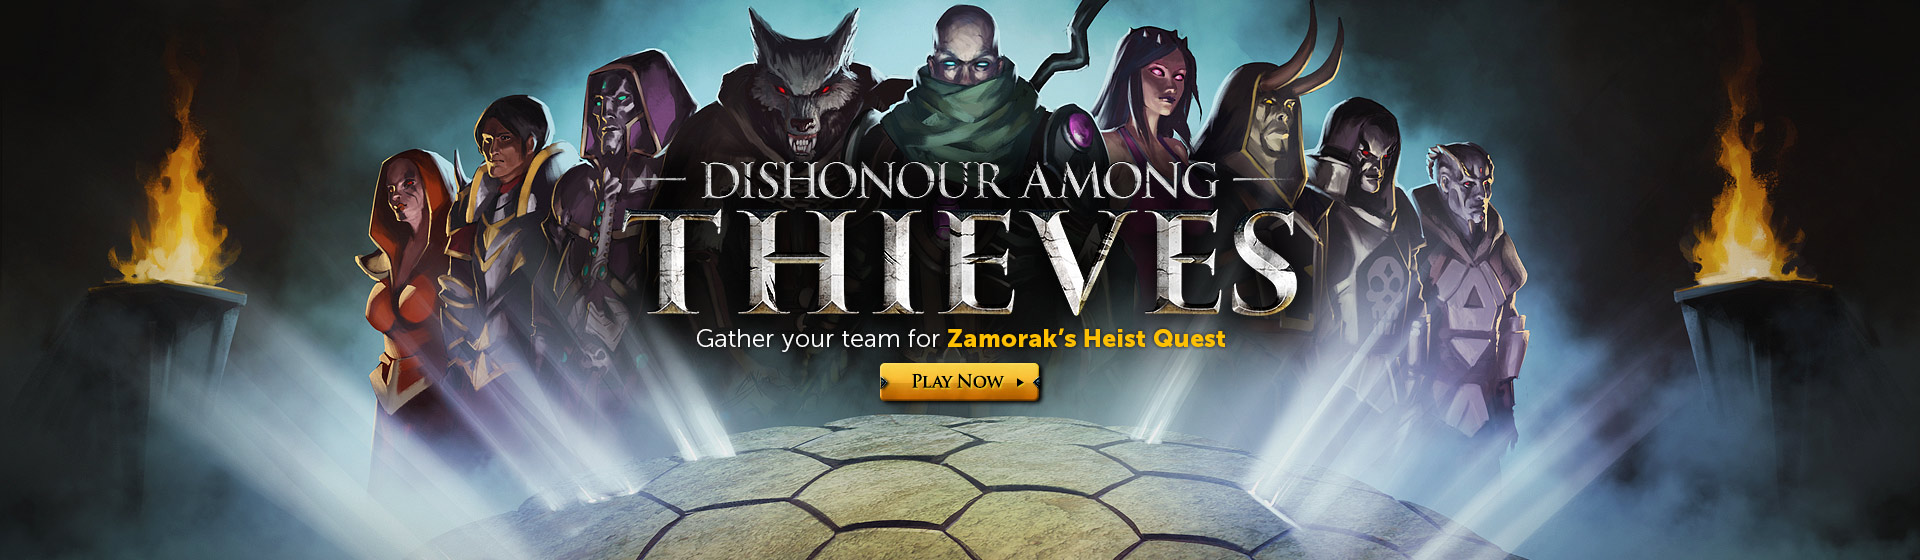 Dishonour among Thieves banner.jpg